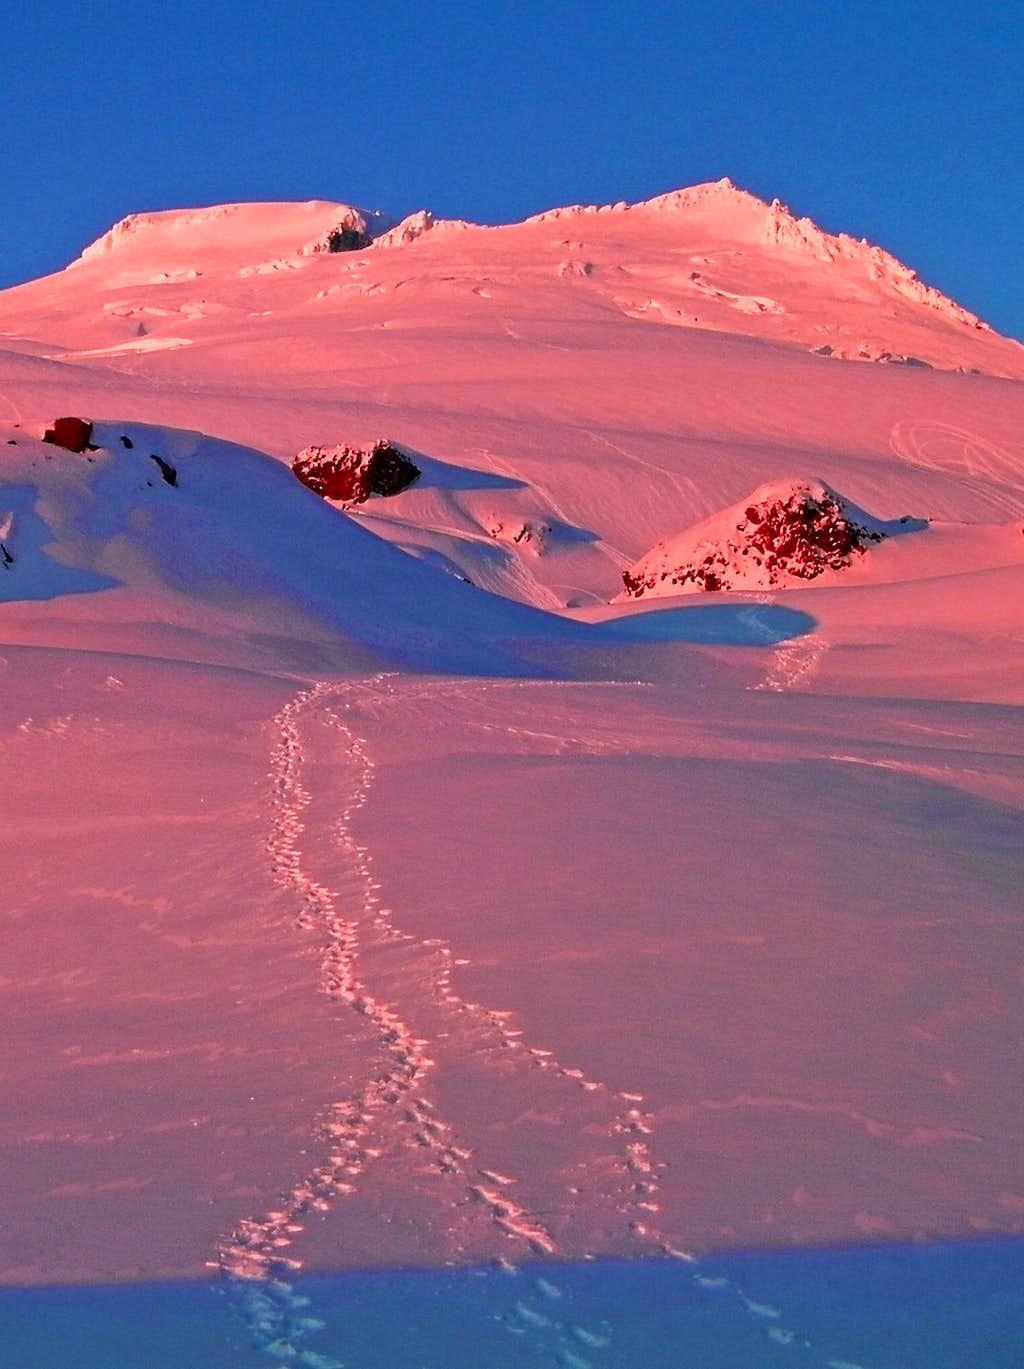 Pink Alpenglow on Mount Baker